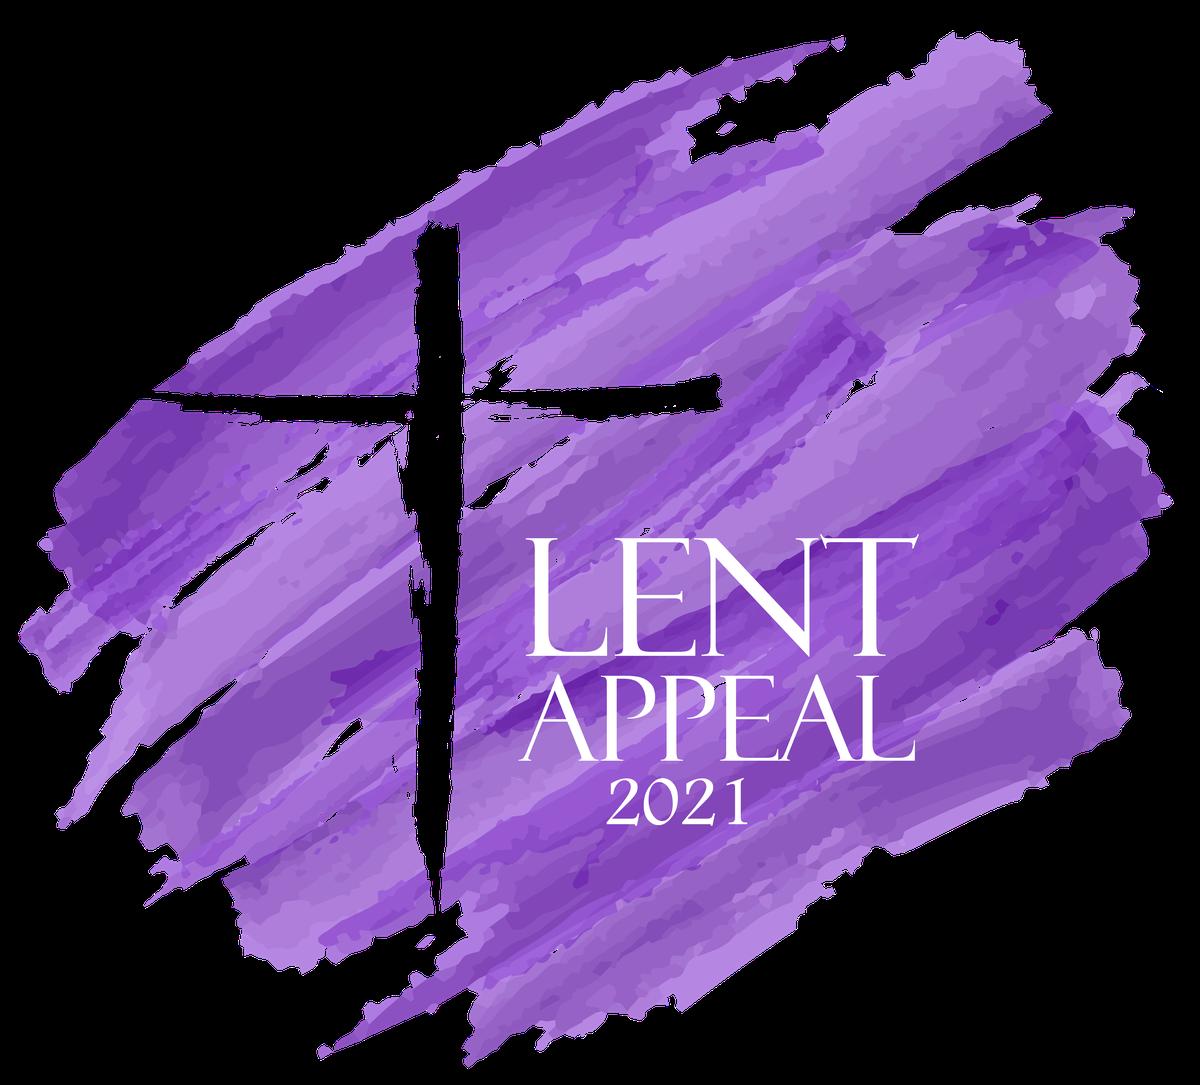 lent appeal.png